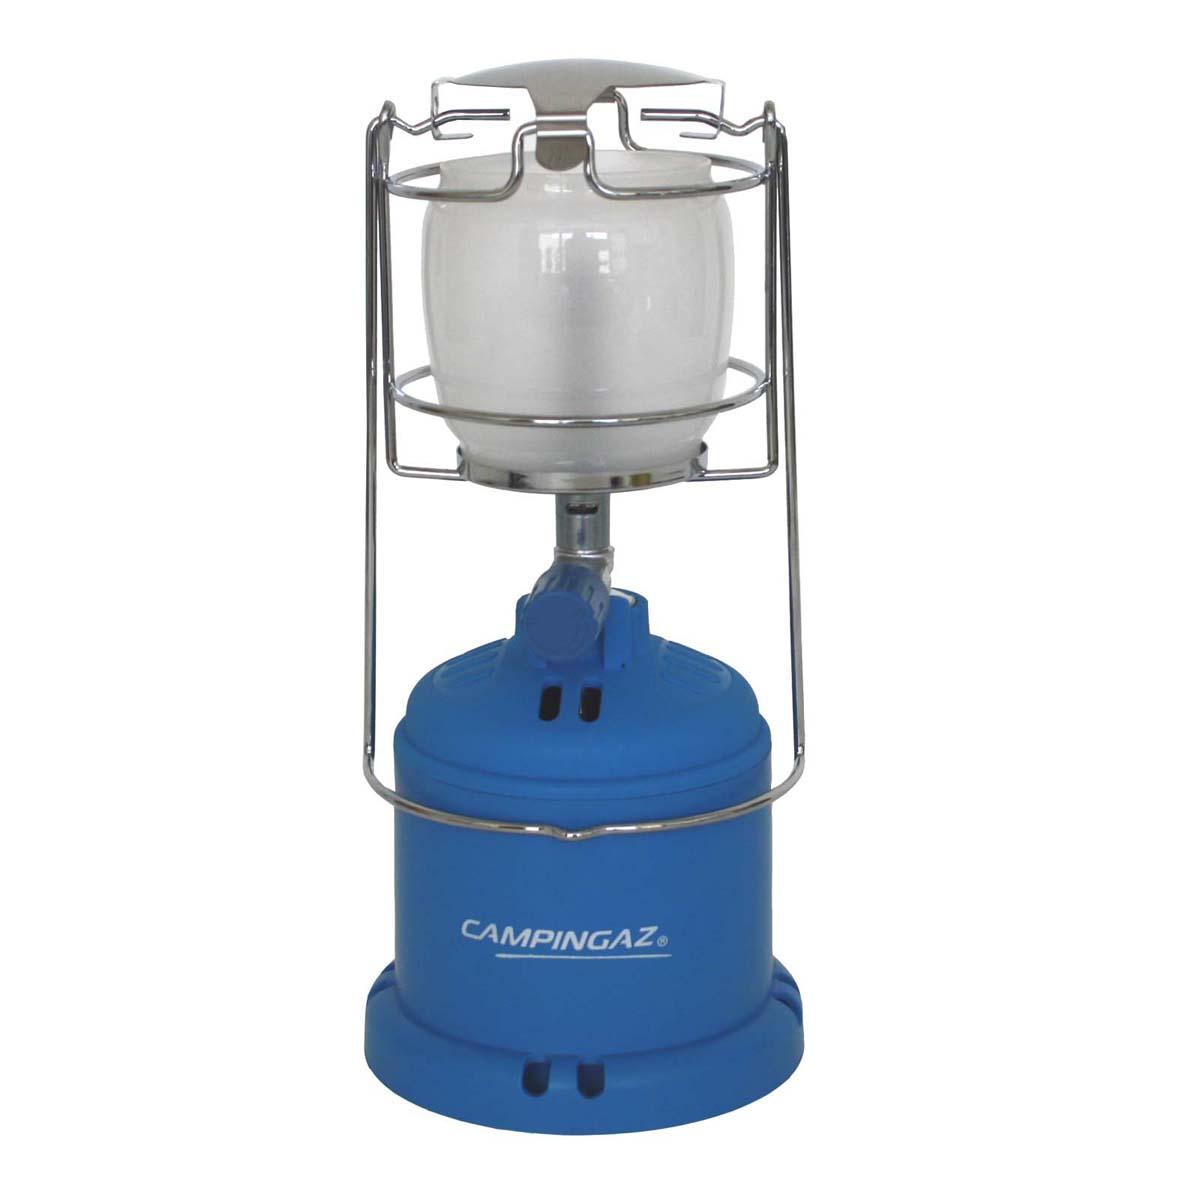 Campingaz Gaslampe 206L Gaslaterne Camping Lampe Leuchte Campinglaterne Outdoor